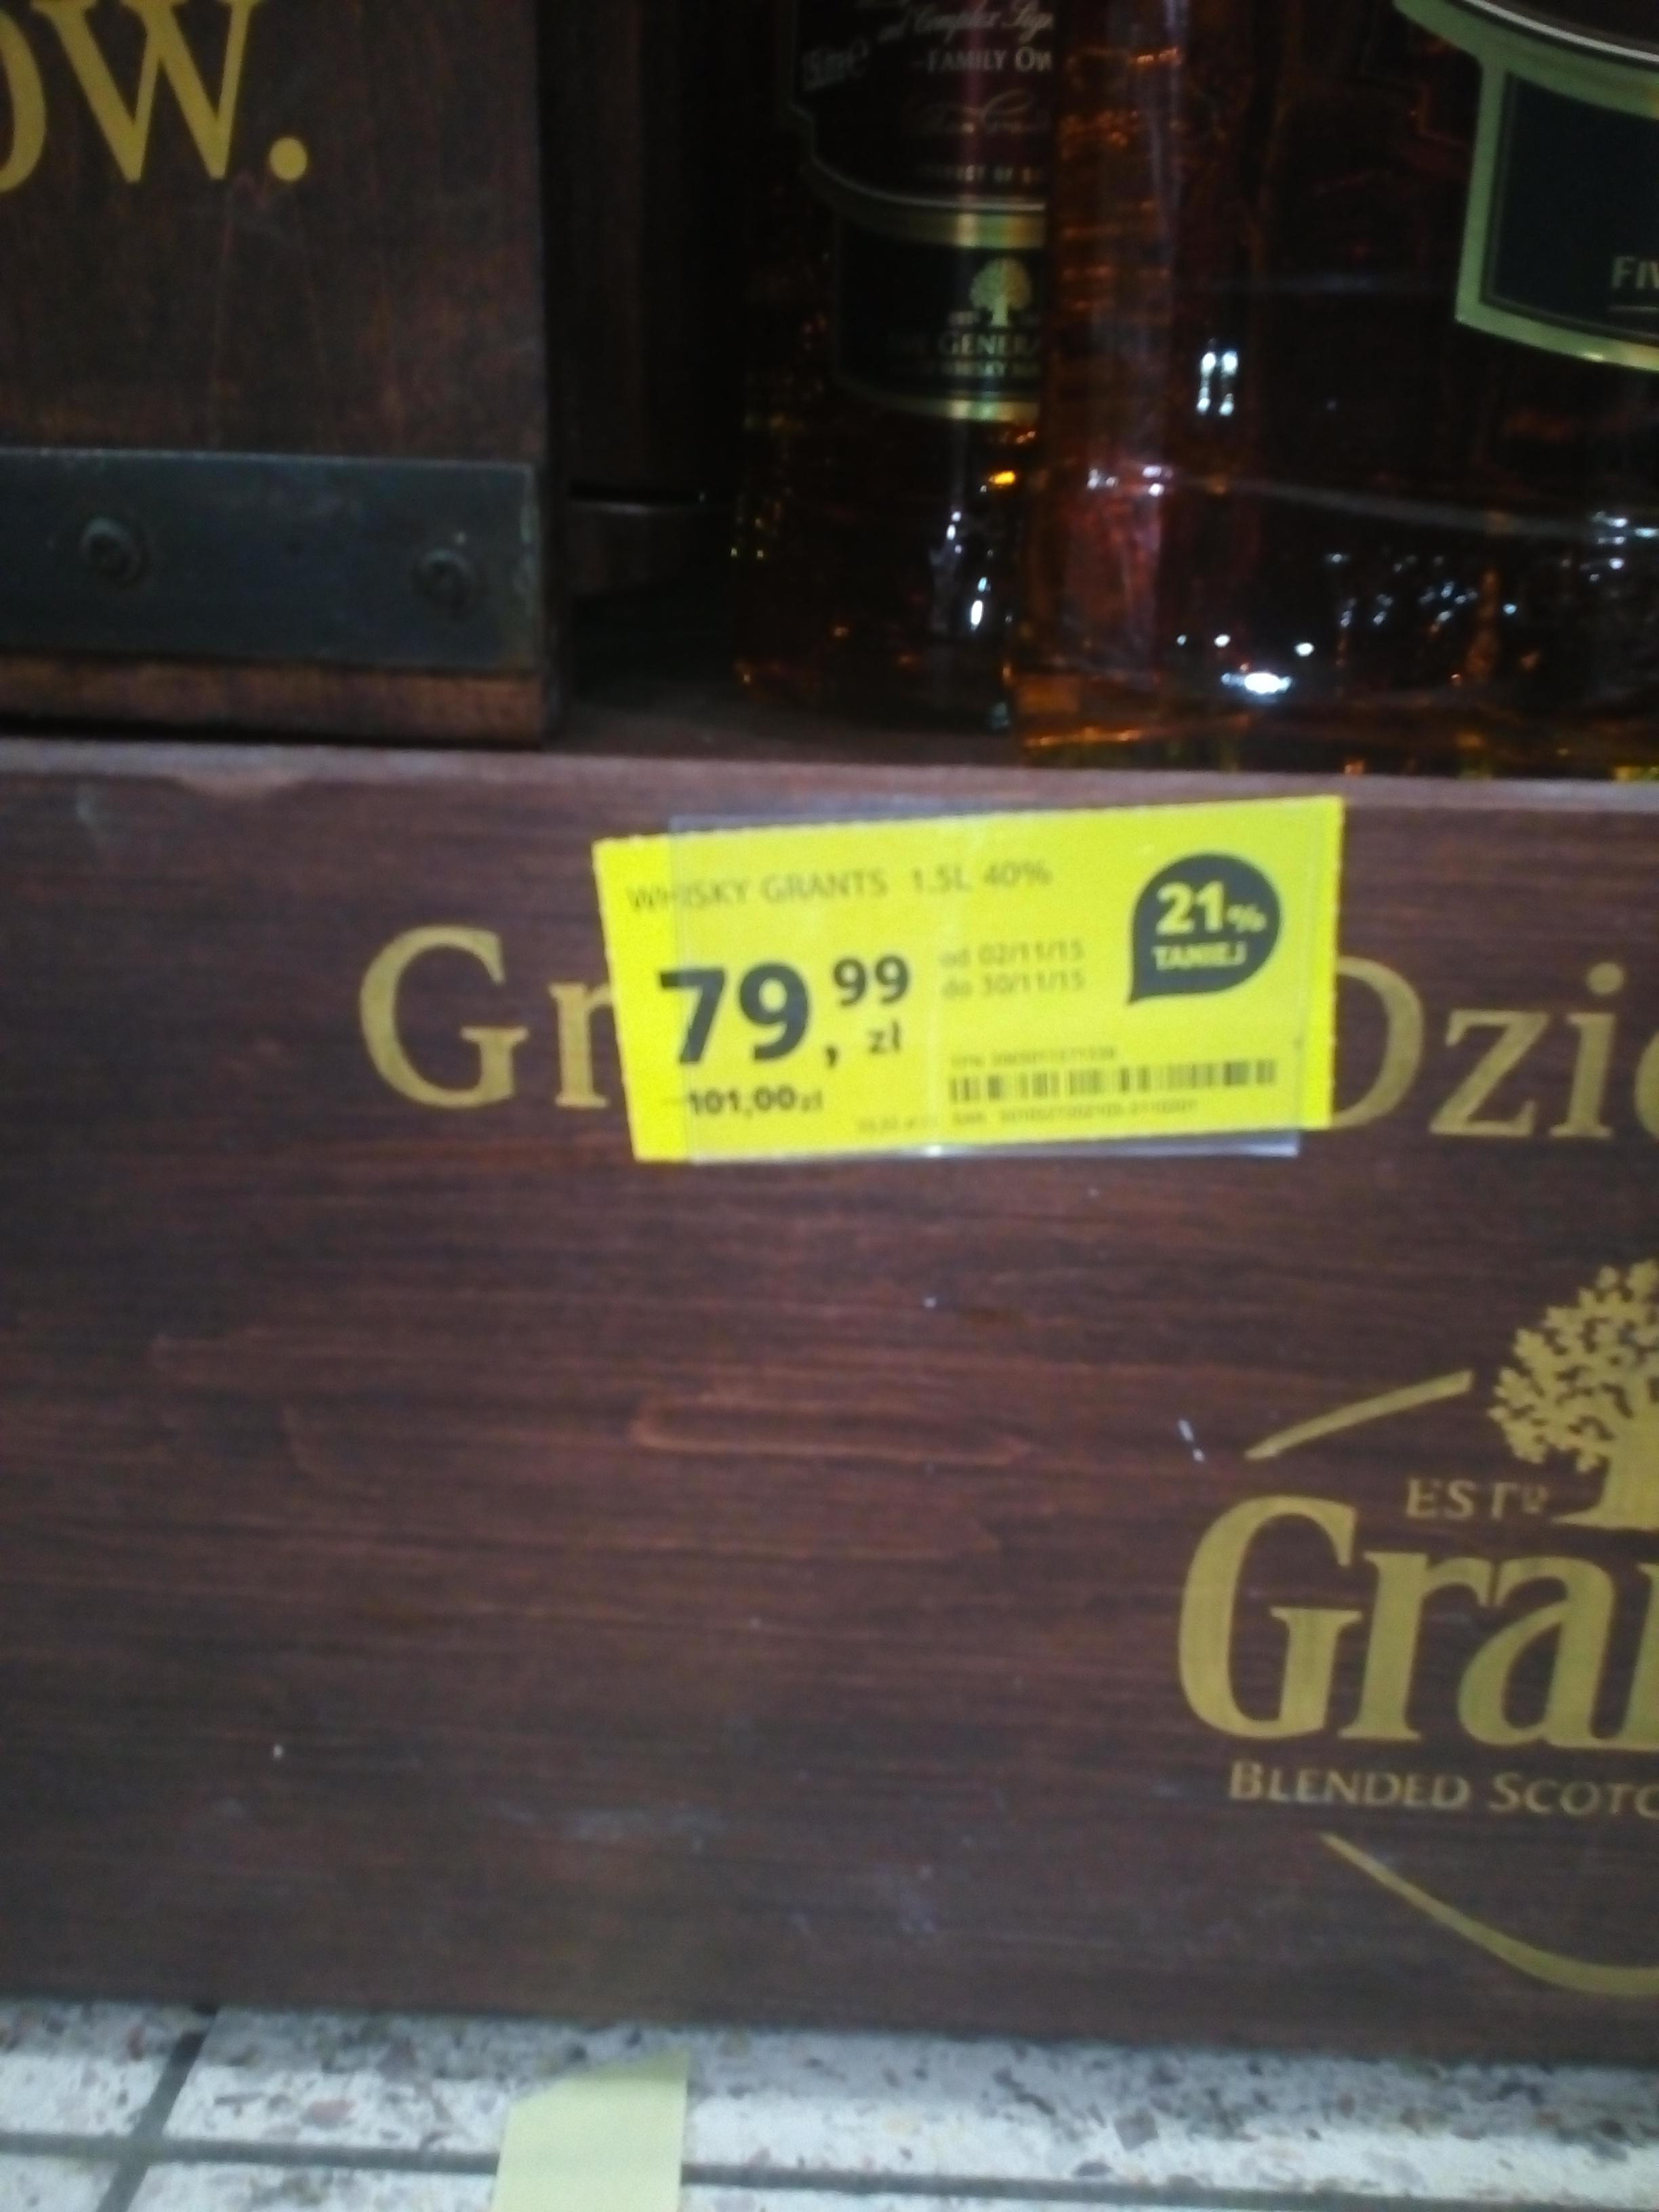 Whisky Grant's 1,5L za 79,99zł @ Tesco